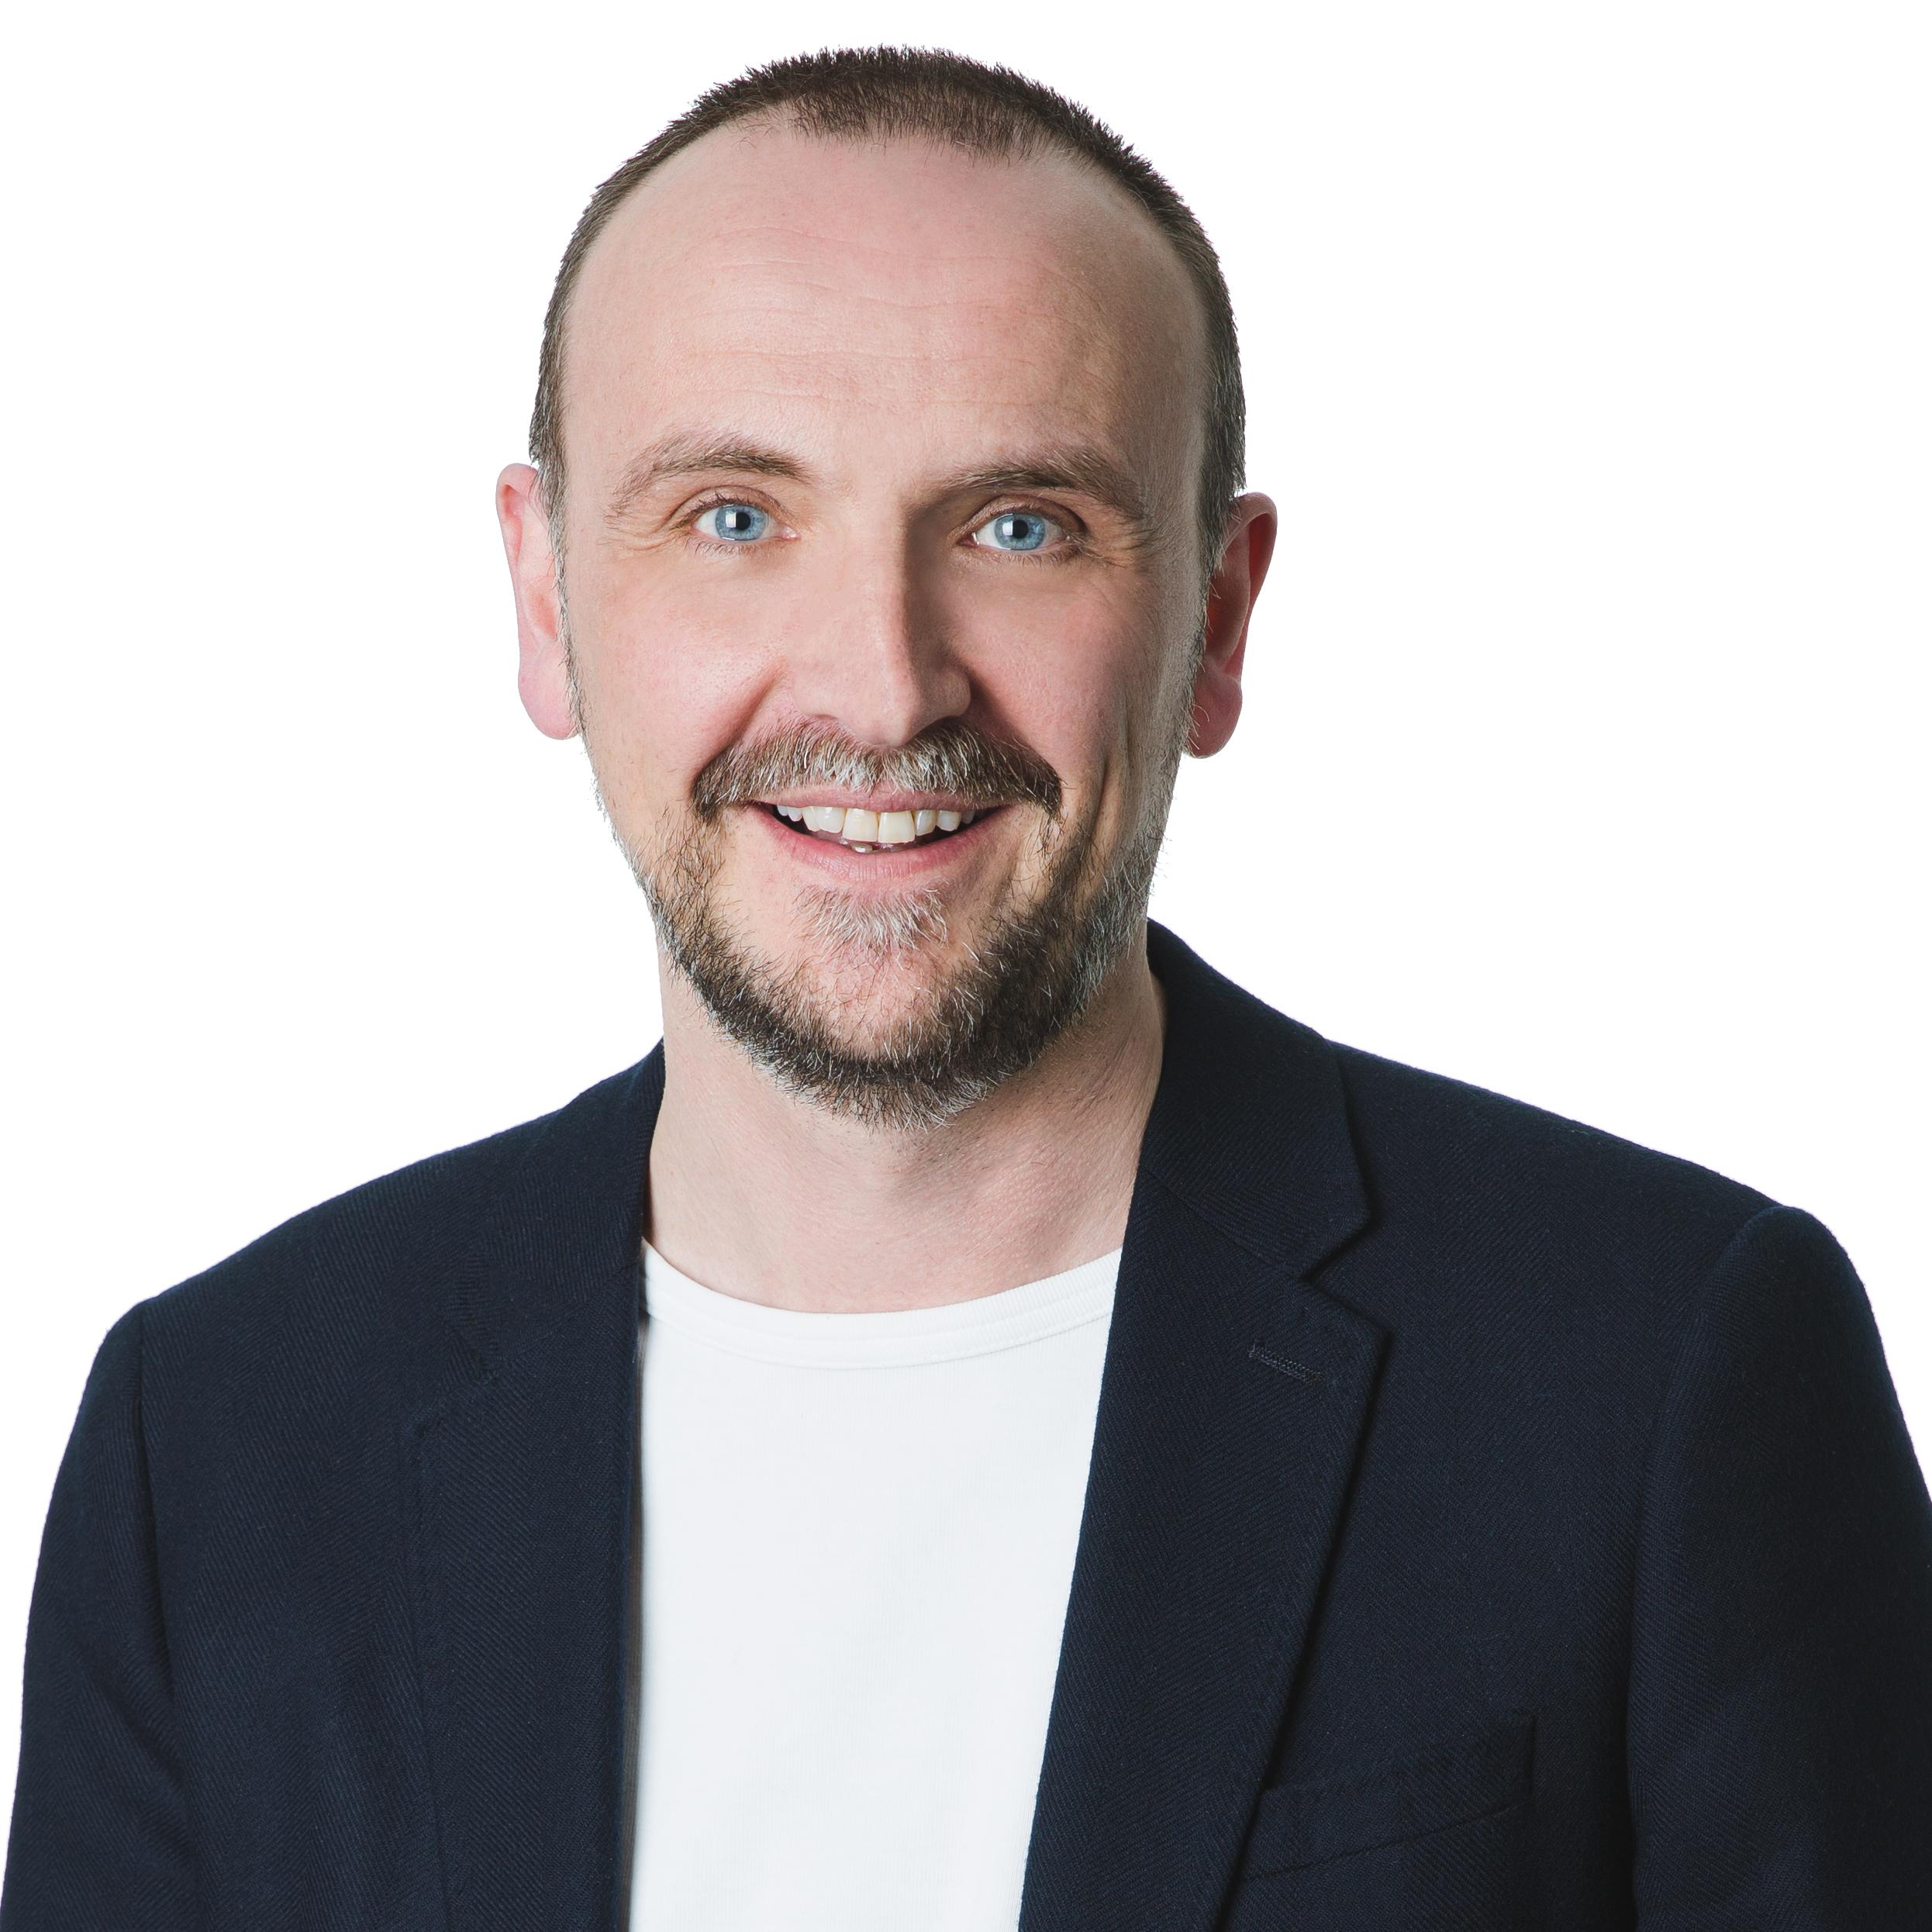 Gareth Smith